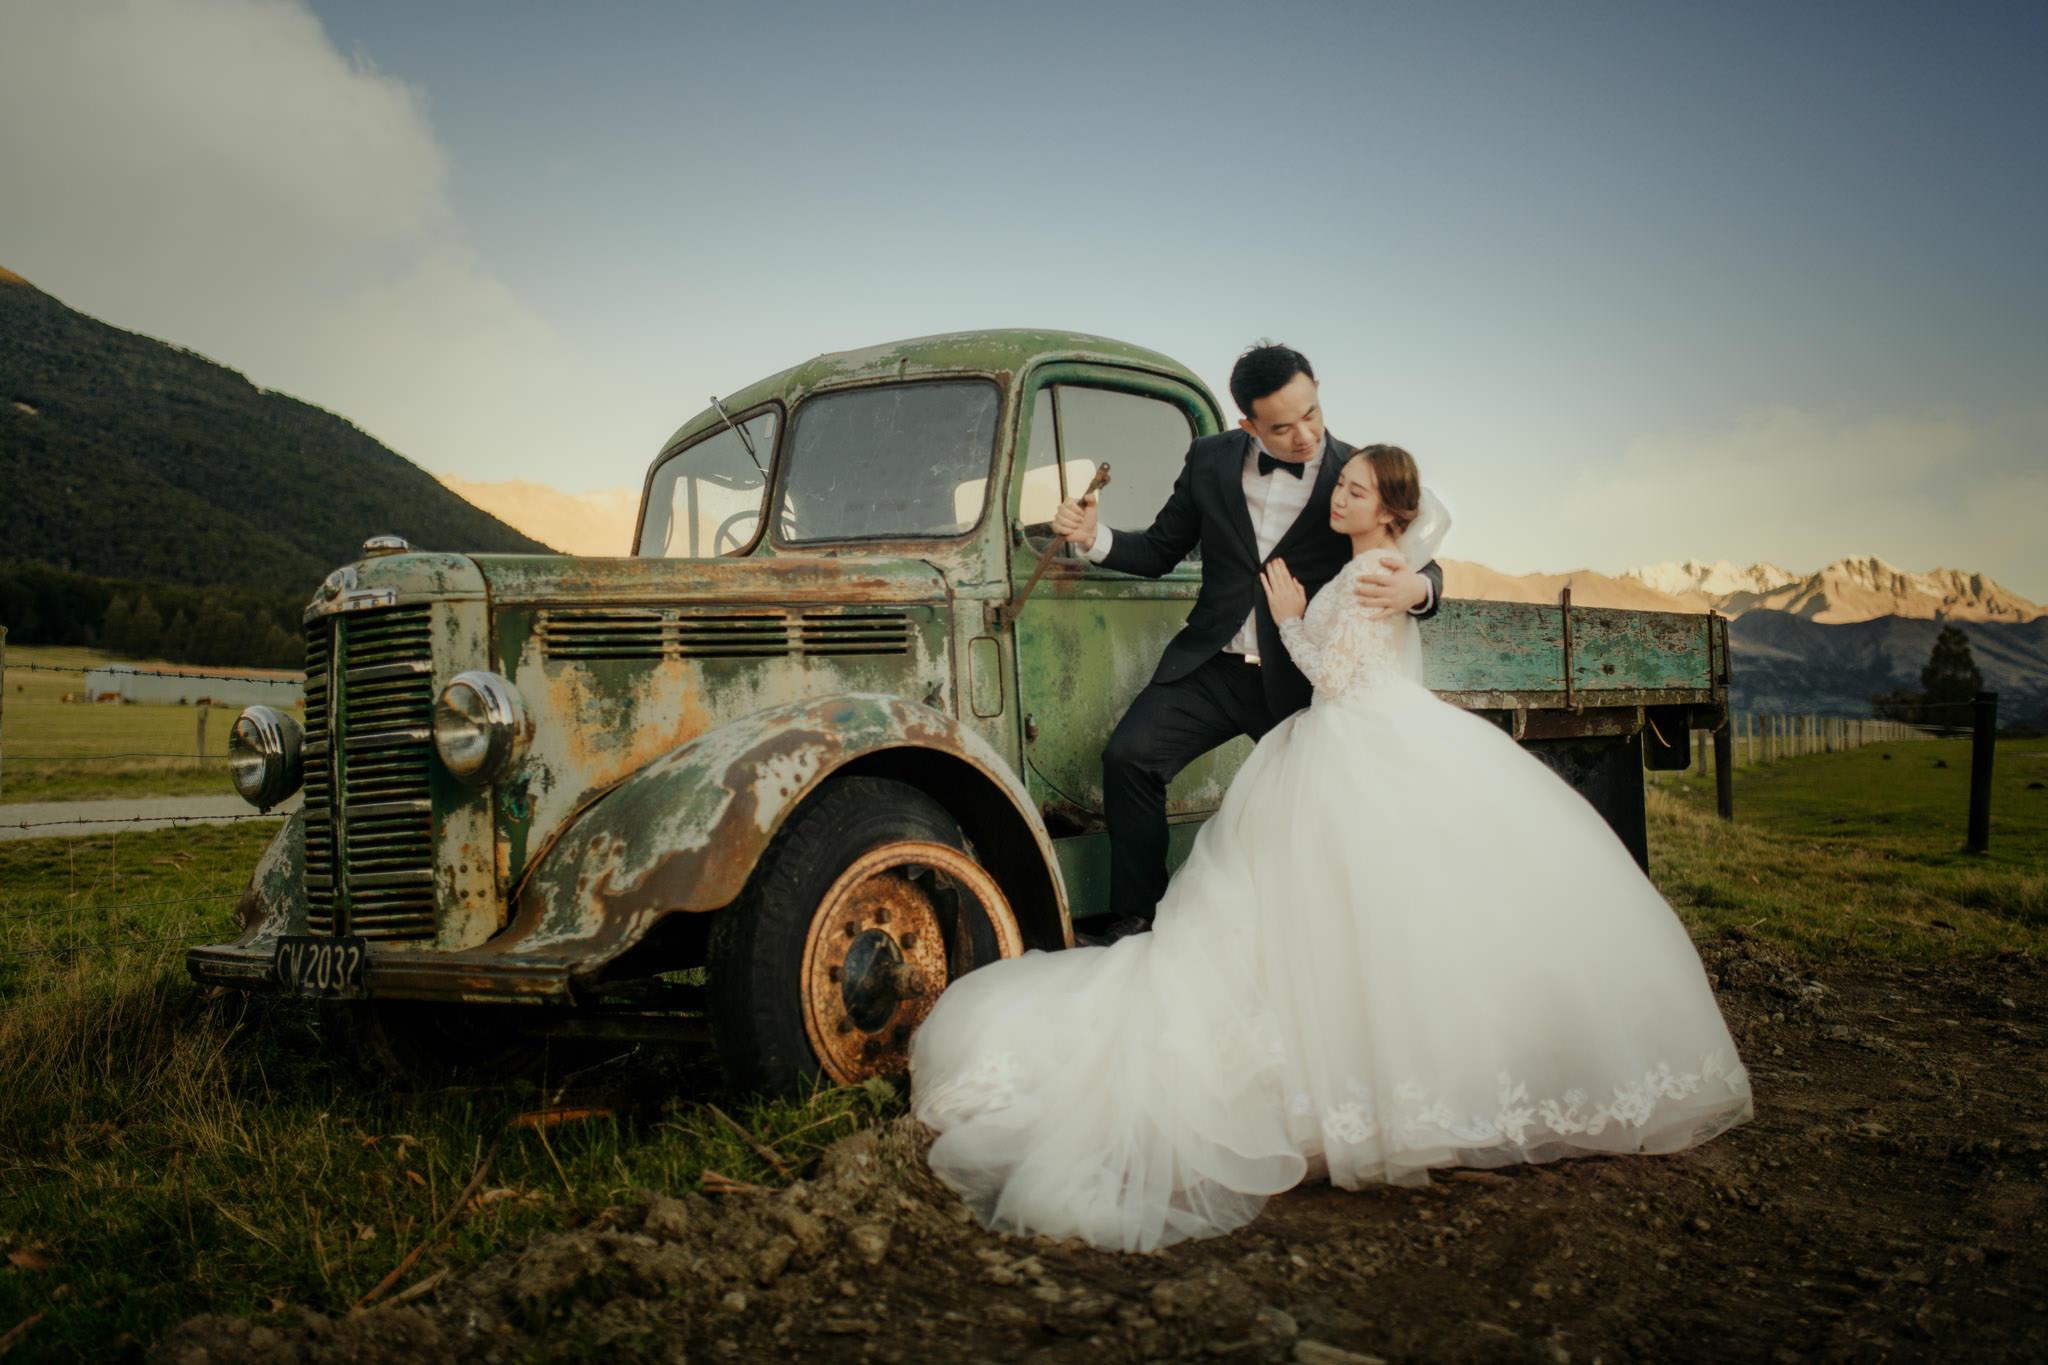 Queenstown New Zealand Prewedding ニュージーランド クイーンズタウン ウェディング 前撮り